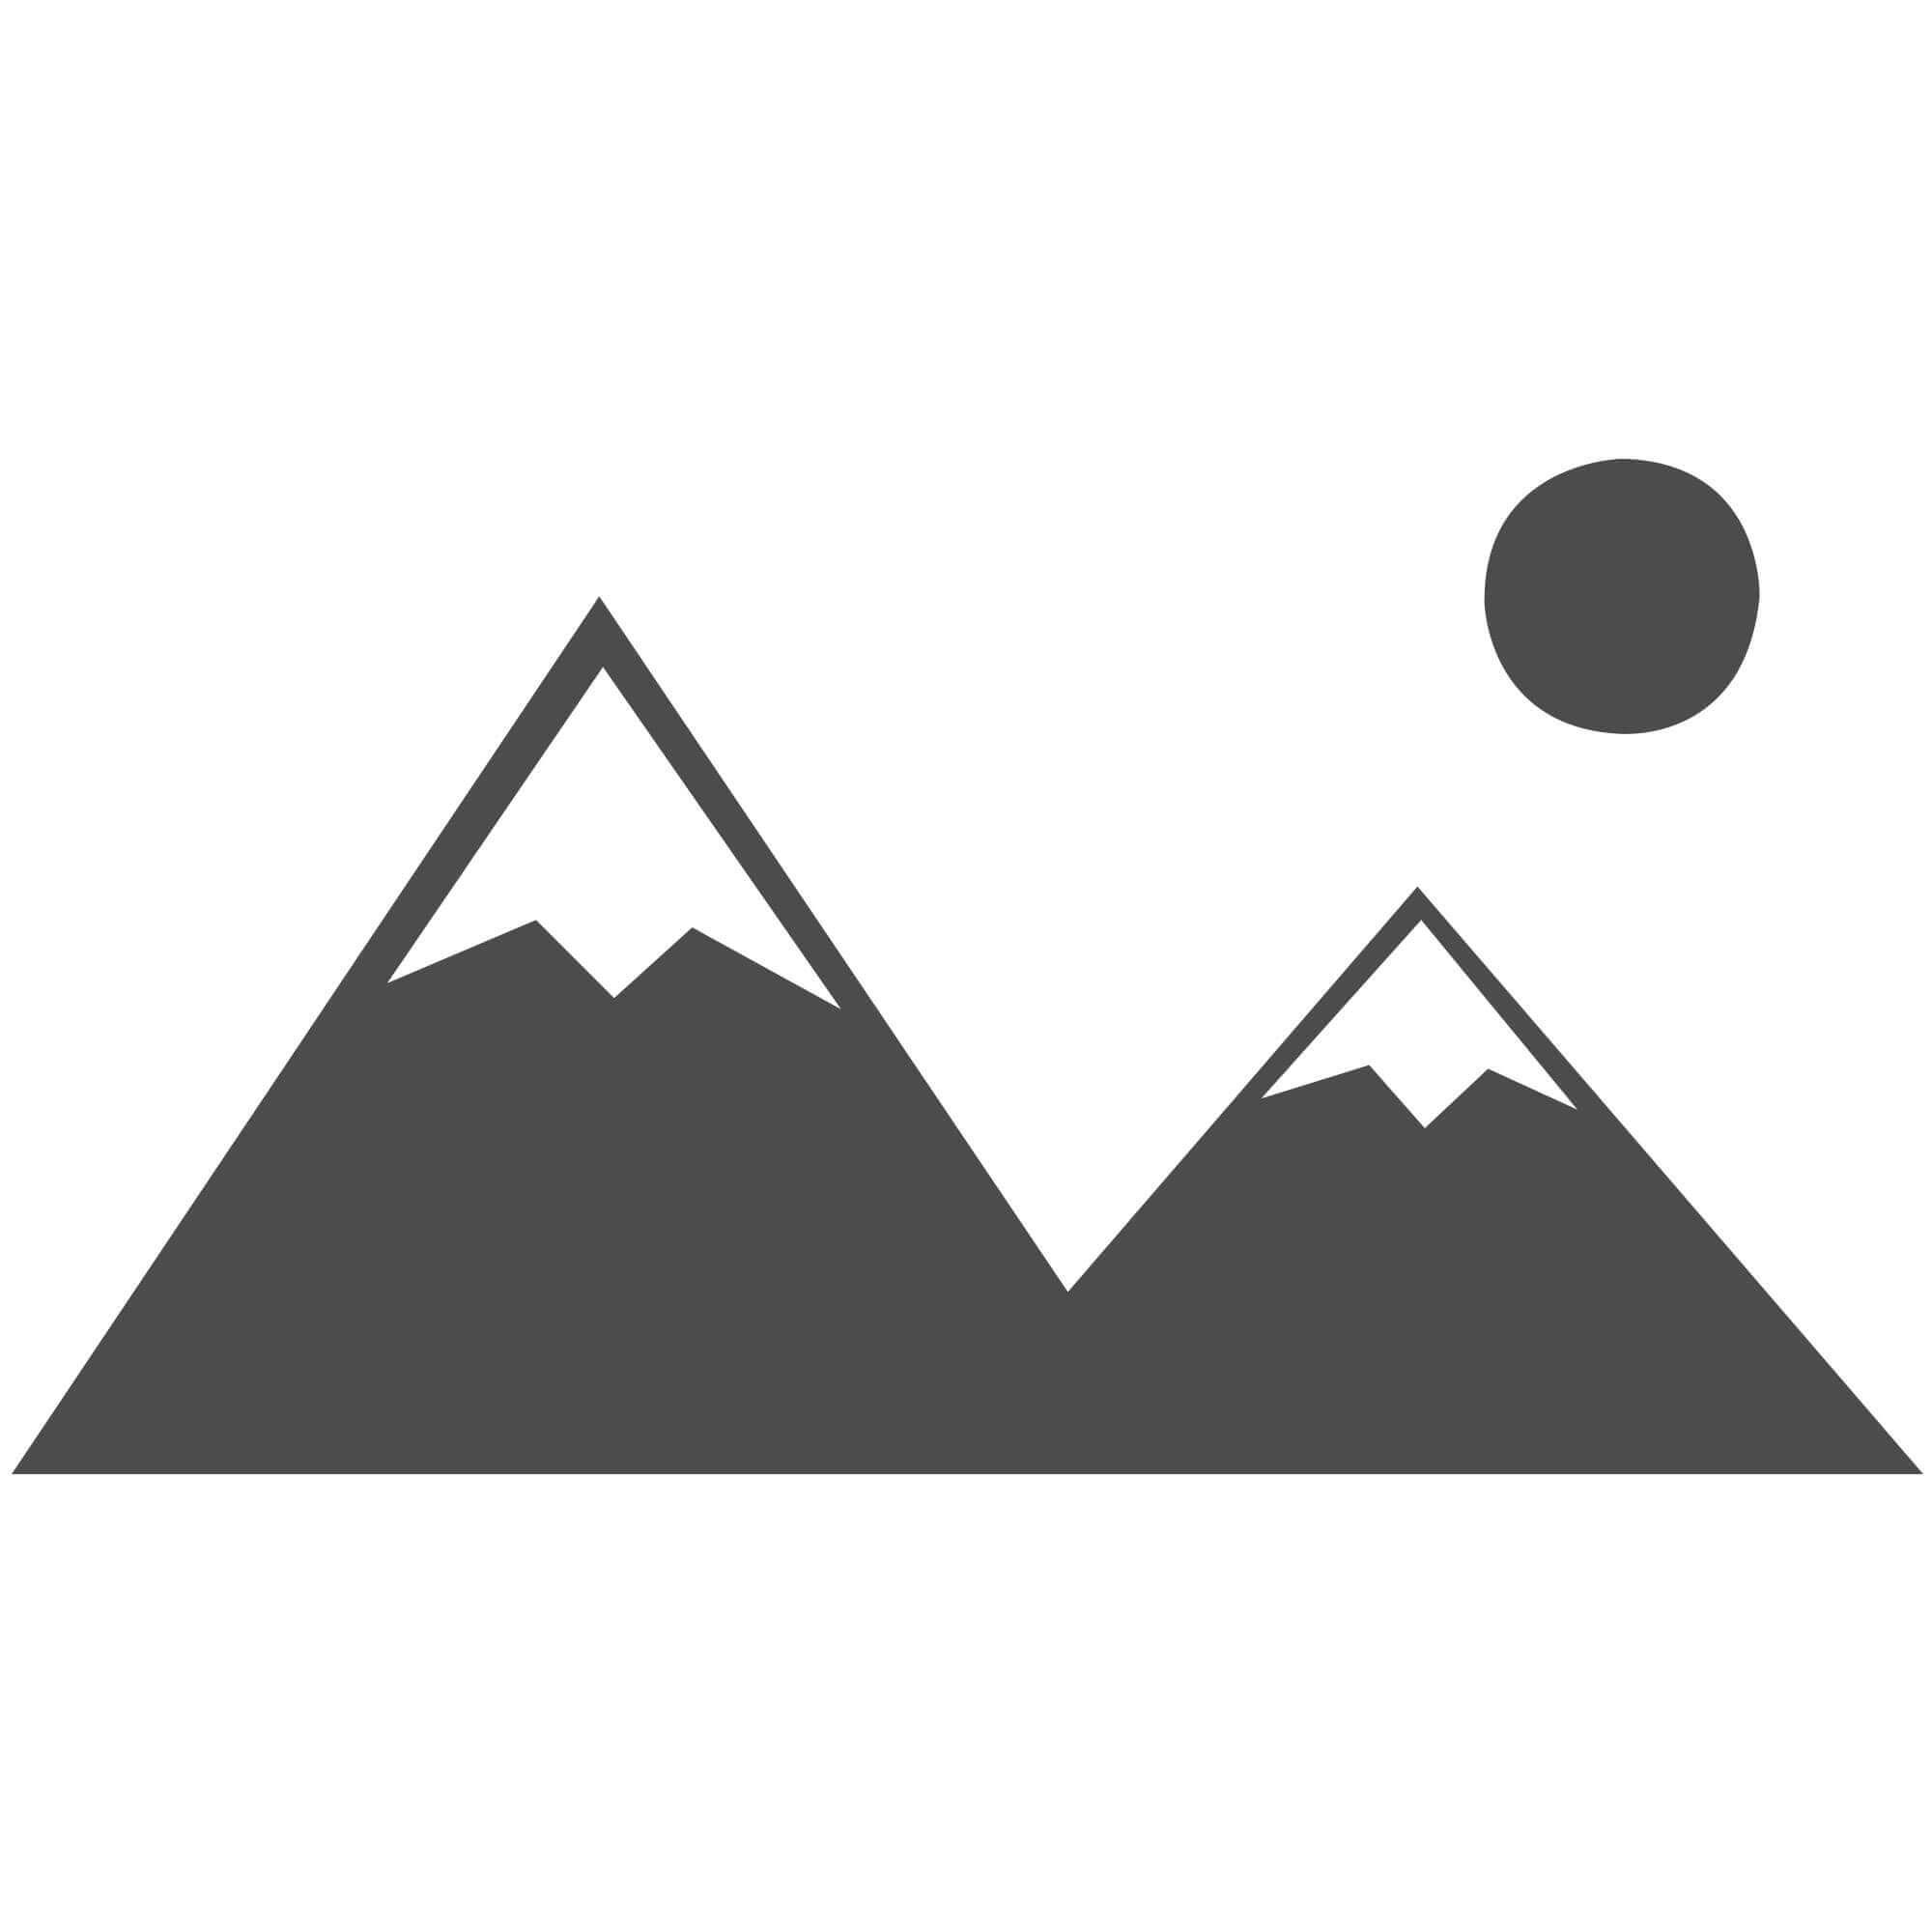 Vision Trimline TL120 Trimless